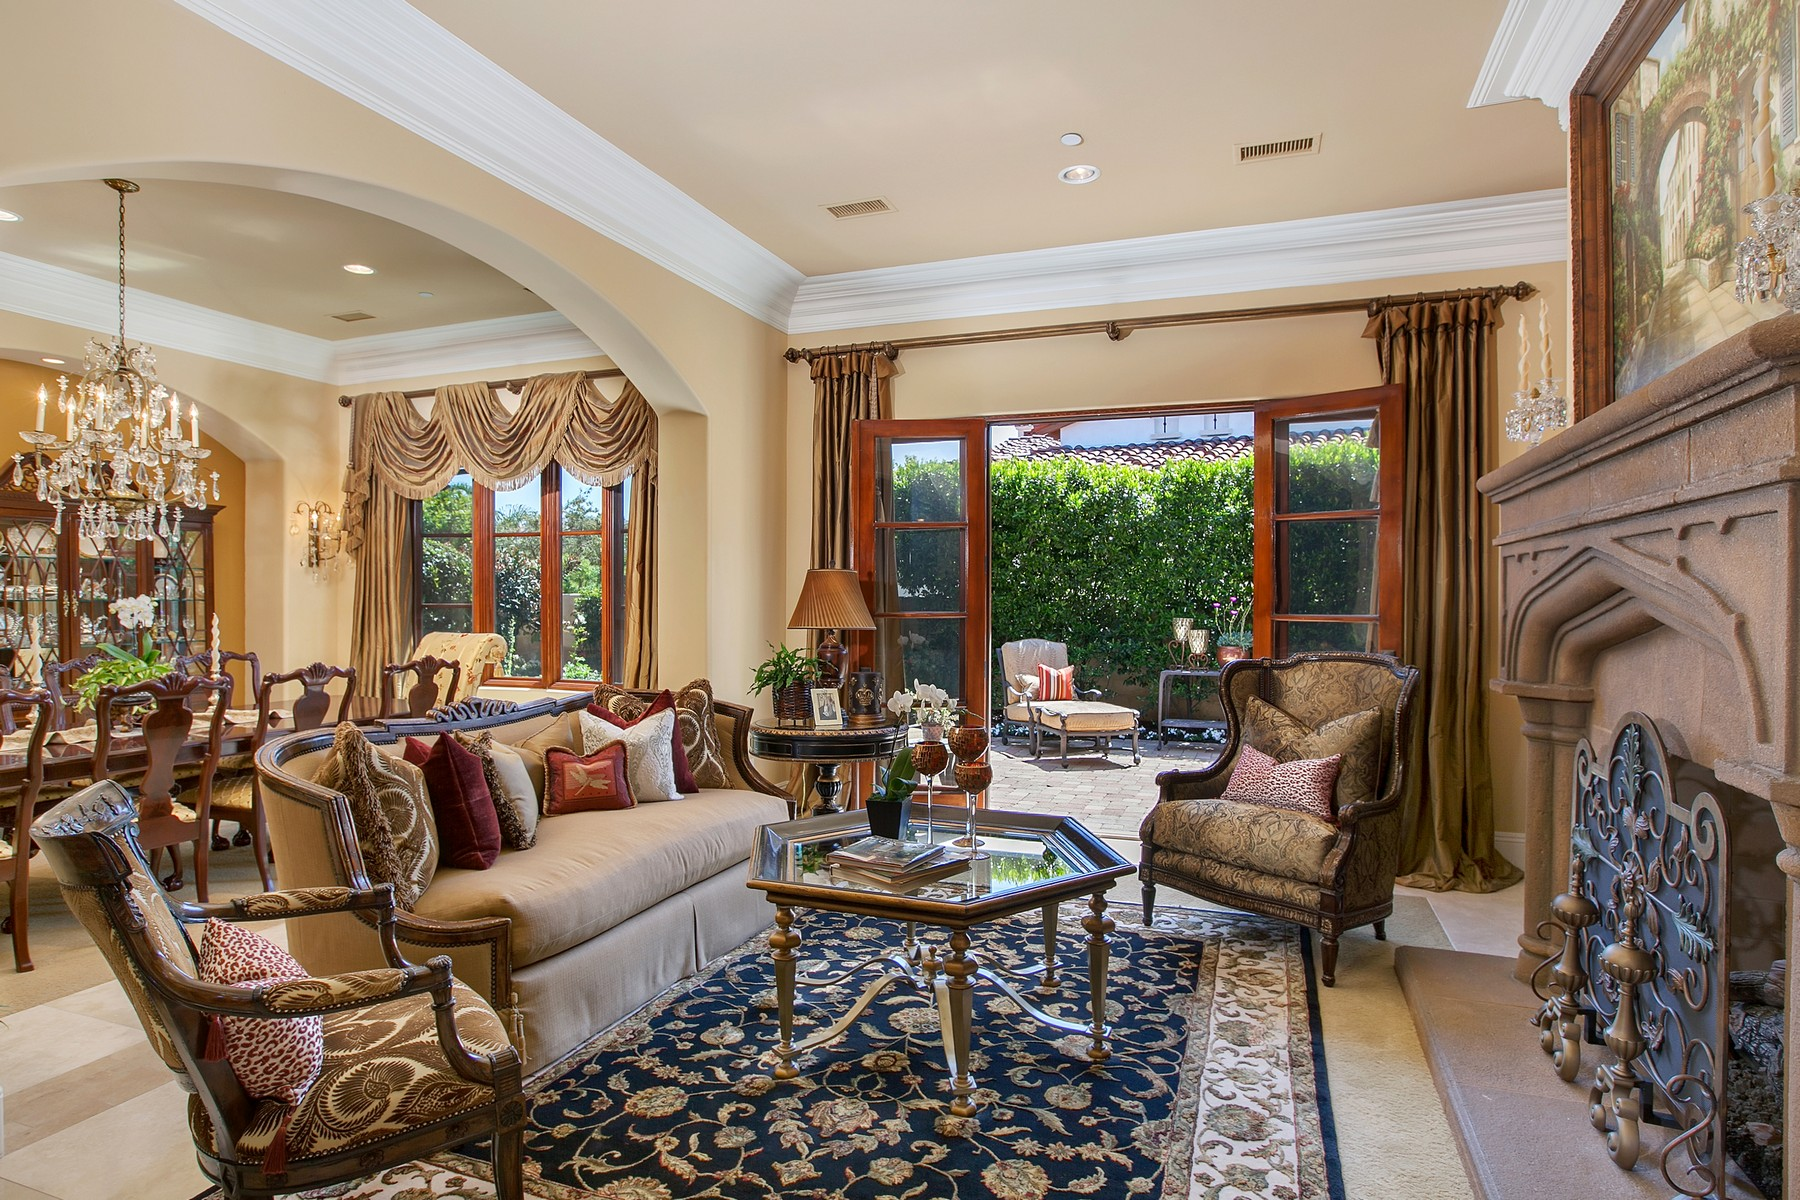 Additional photo for property listing at 7758 - 7760 Road To Zanzibar  Rancho Santa Fe, California 92127 Estados Unidos